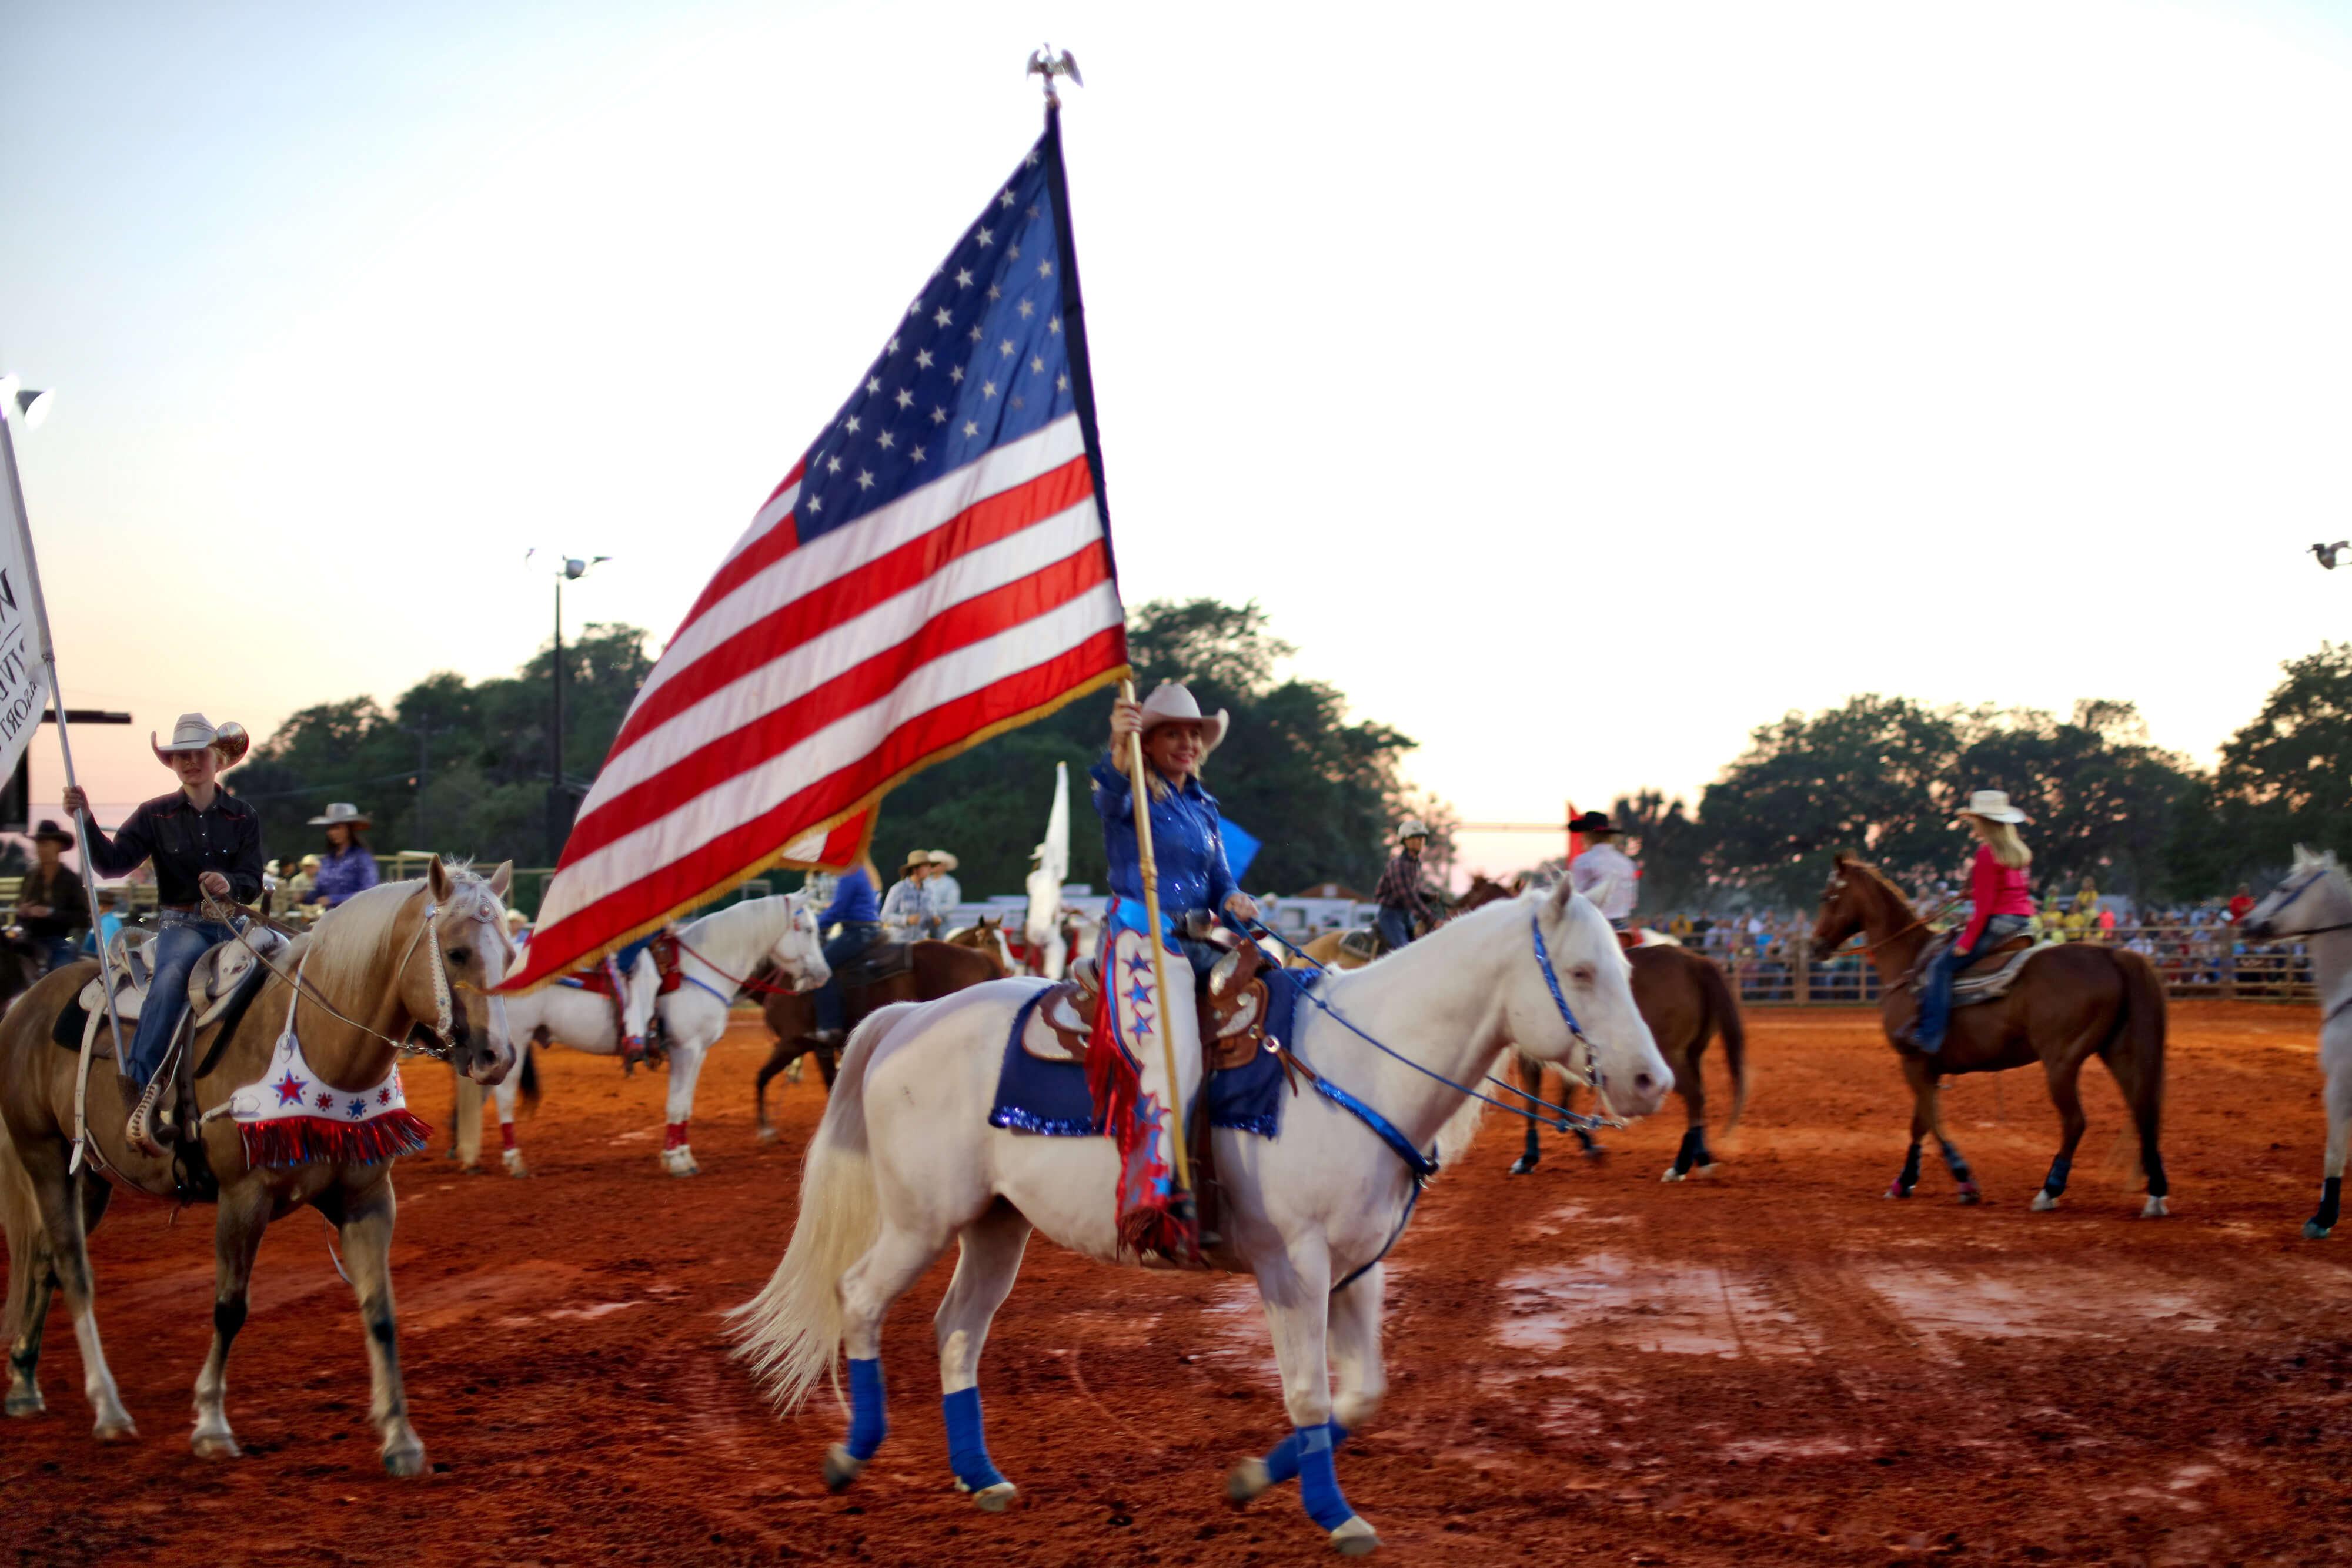 Patriotic Rodeo Near Orlando, FL | Westgate River Ranch Resort & Rodeo | Westgate Resorts